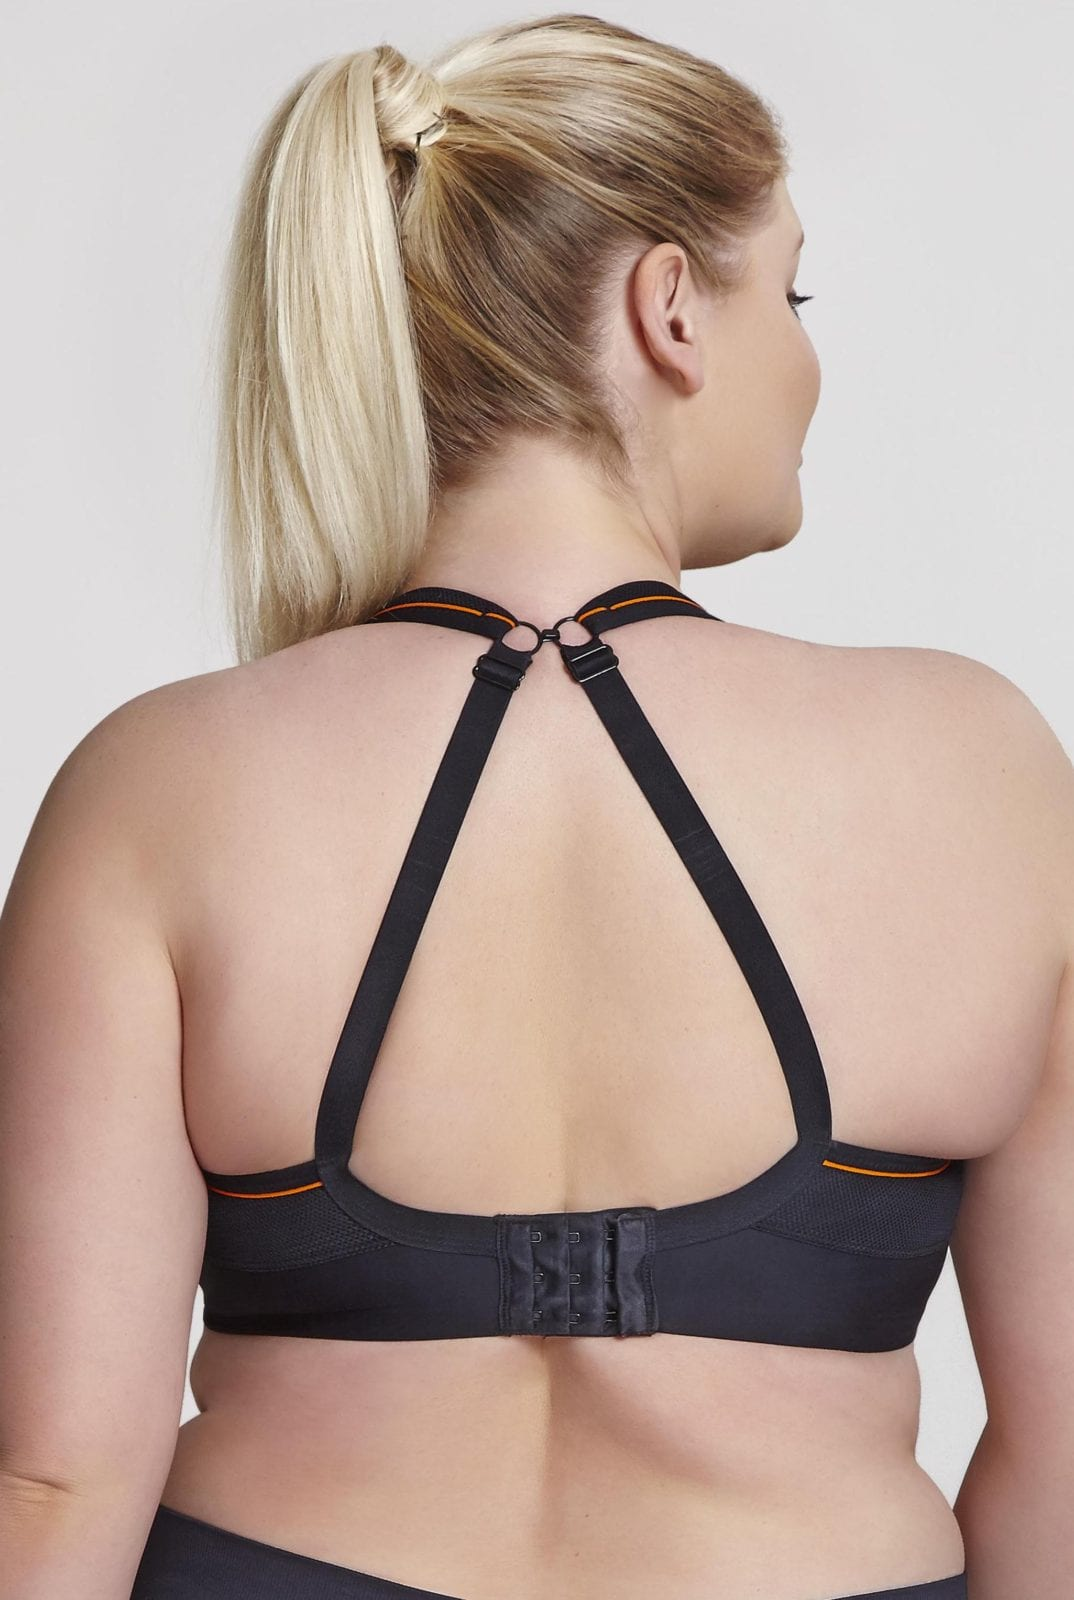 Базовое спортивное белье 9441_013_Non Padded Sports Bra Black Back Trade 4